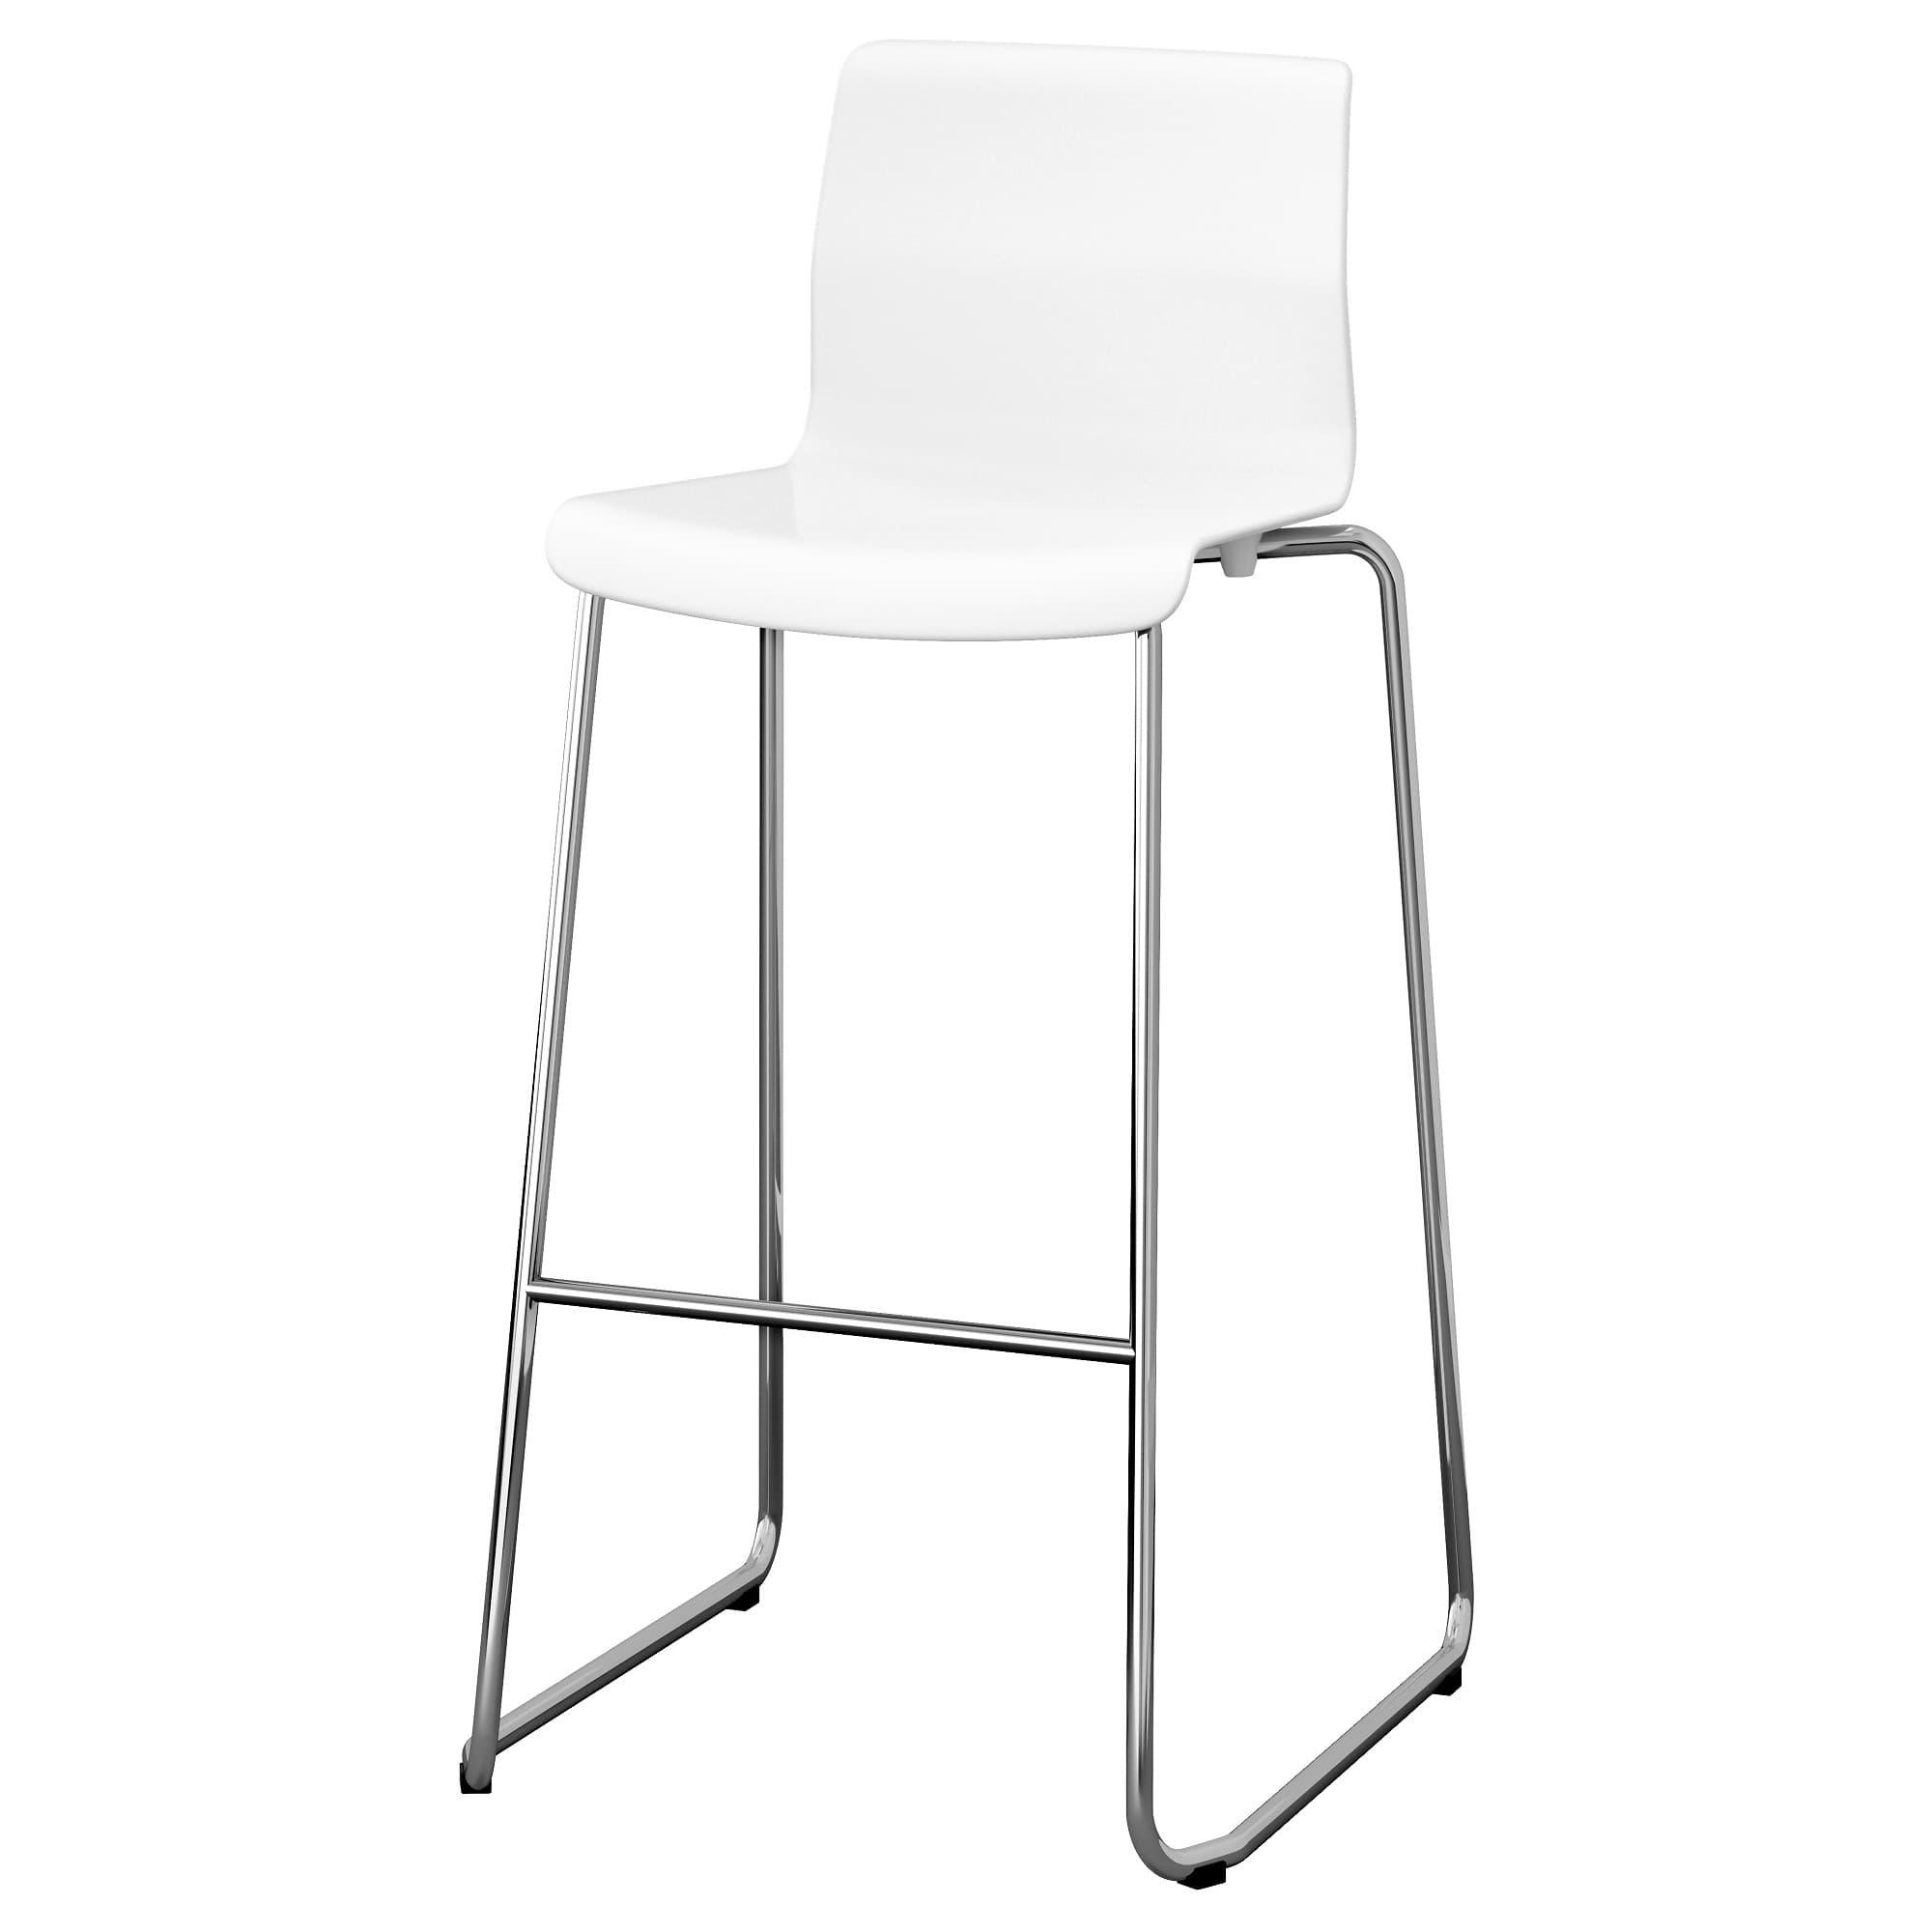 PROMO!! IKEA GLENN Kursi bar, putih, dilapisi krom MURAH /  BUBBLE 3 LAPIS / ORIGINAL / IKEA ORIGINAL